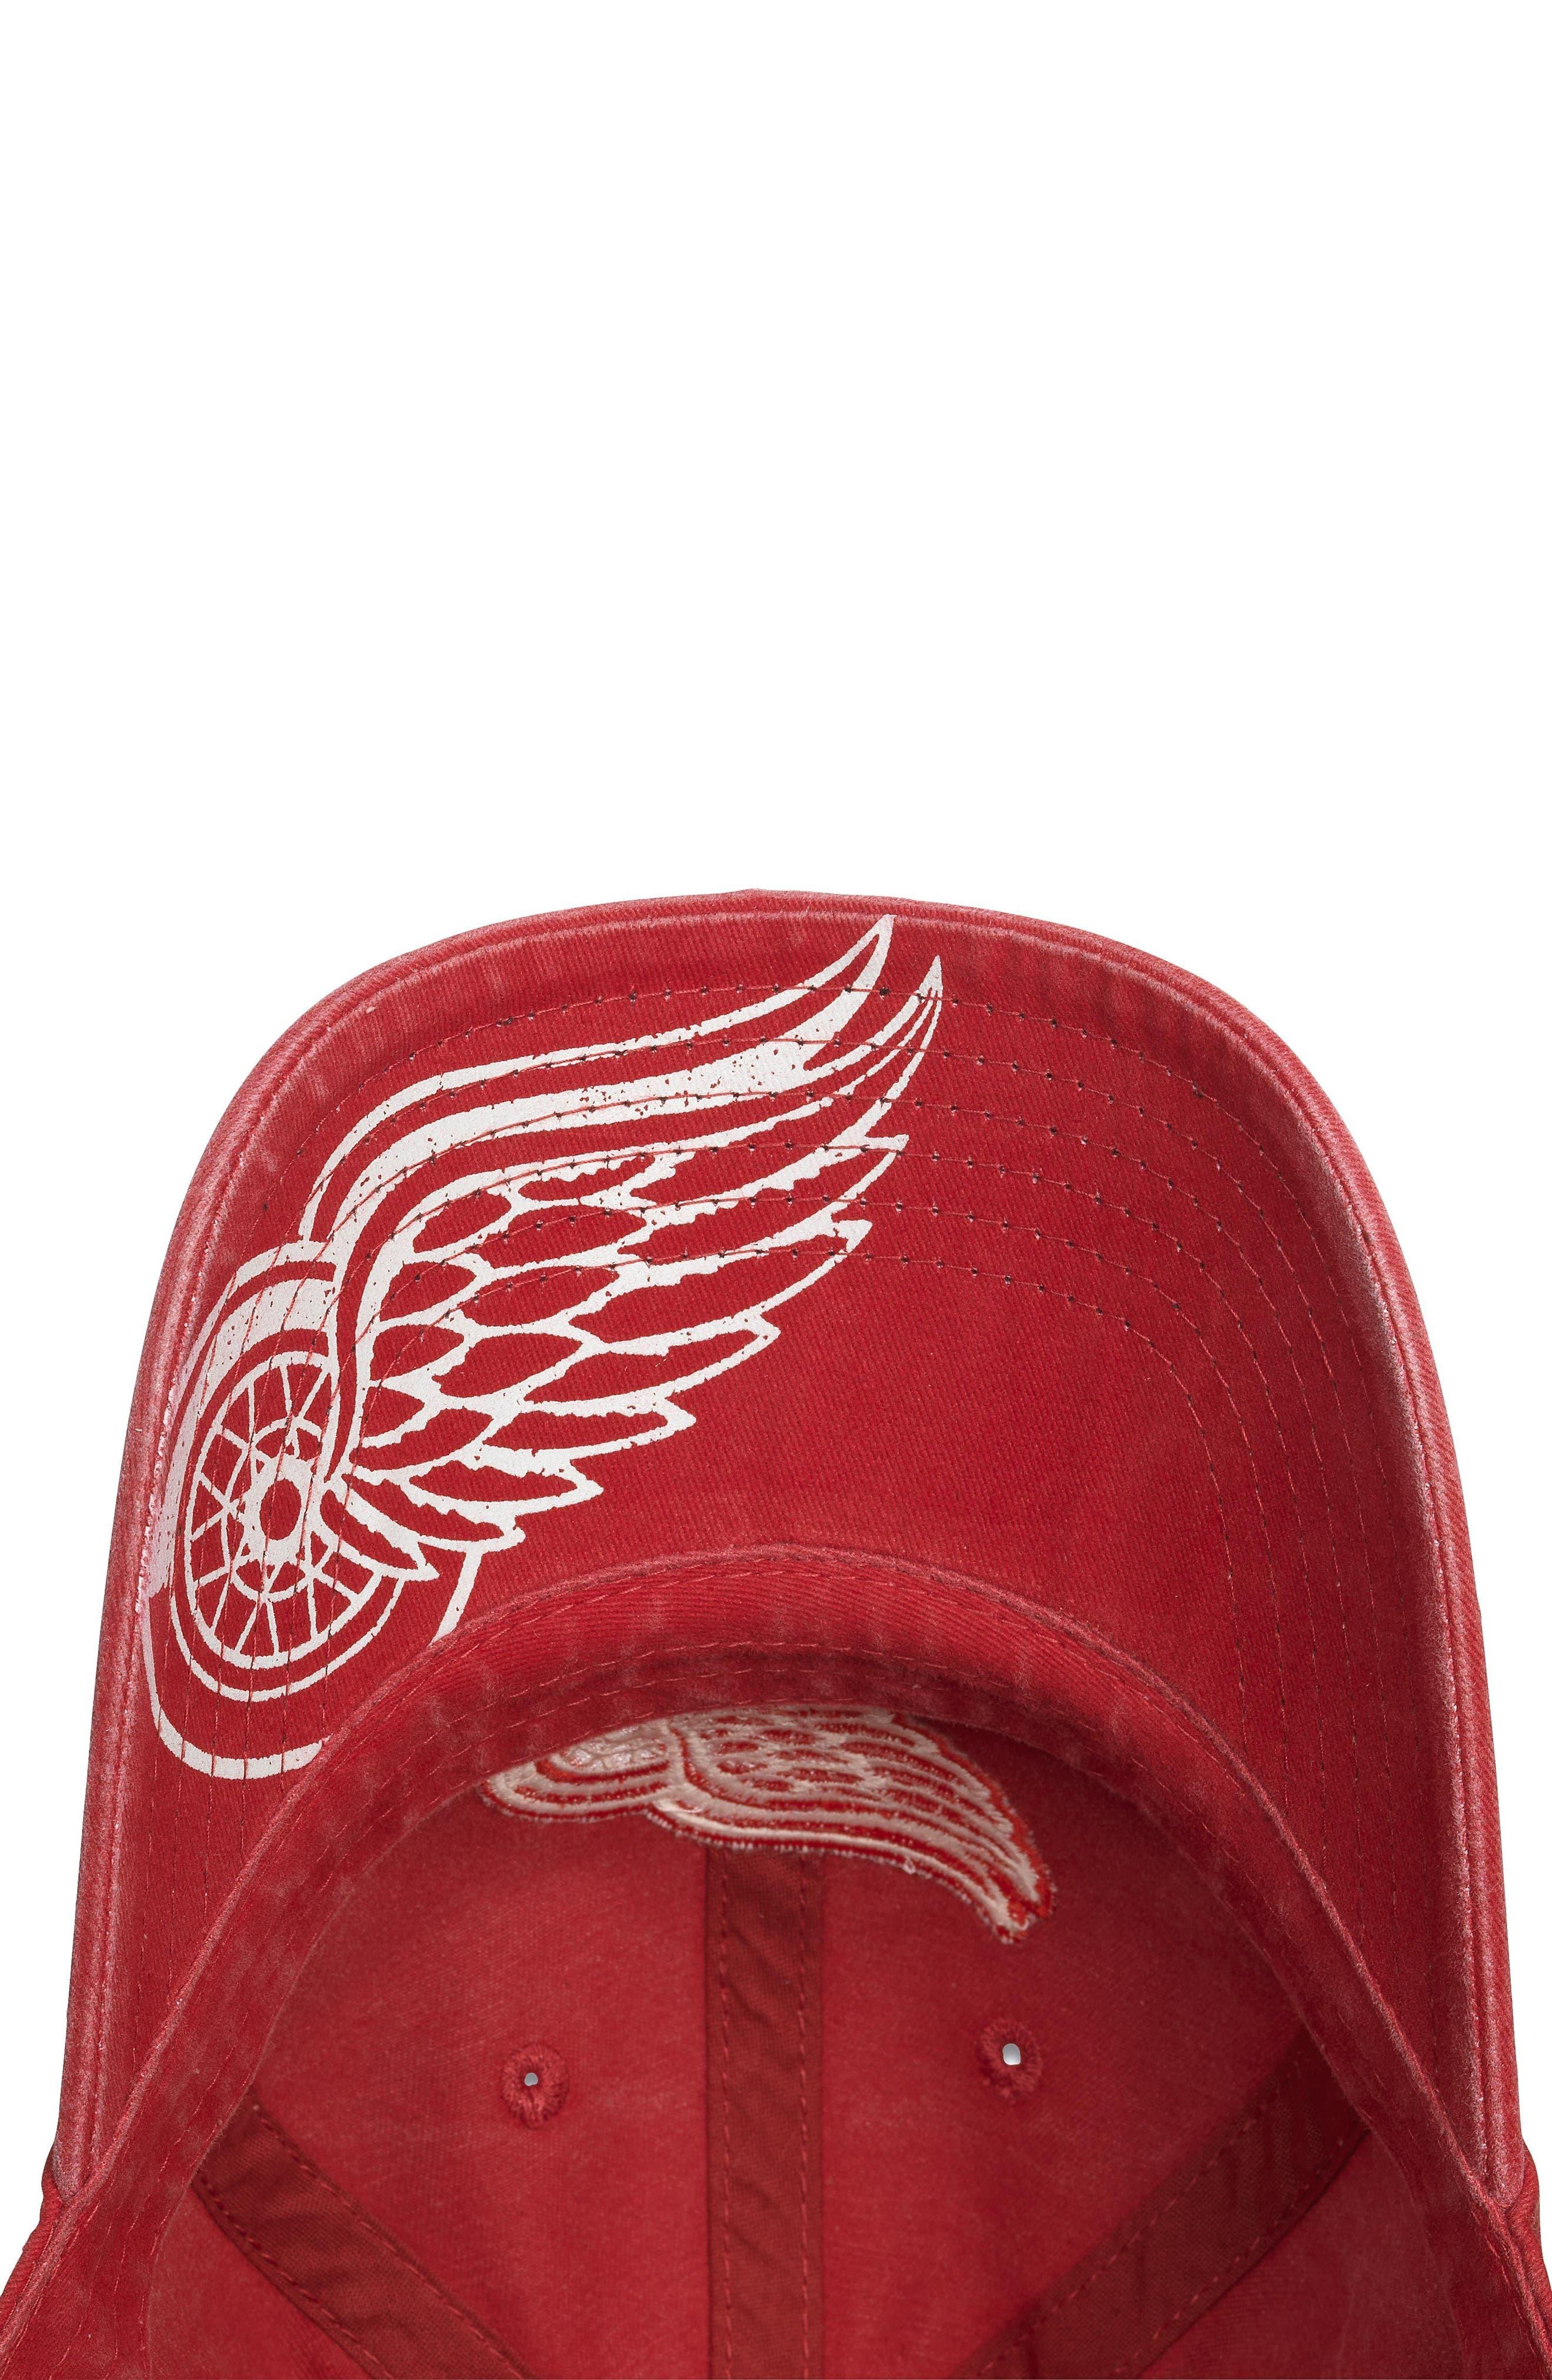 New Raglan NHL Cap,                             Alternate thumbnail 2, color,                             Red Wings/ Red